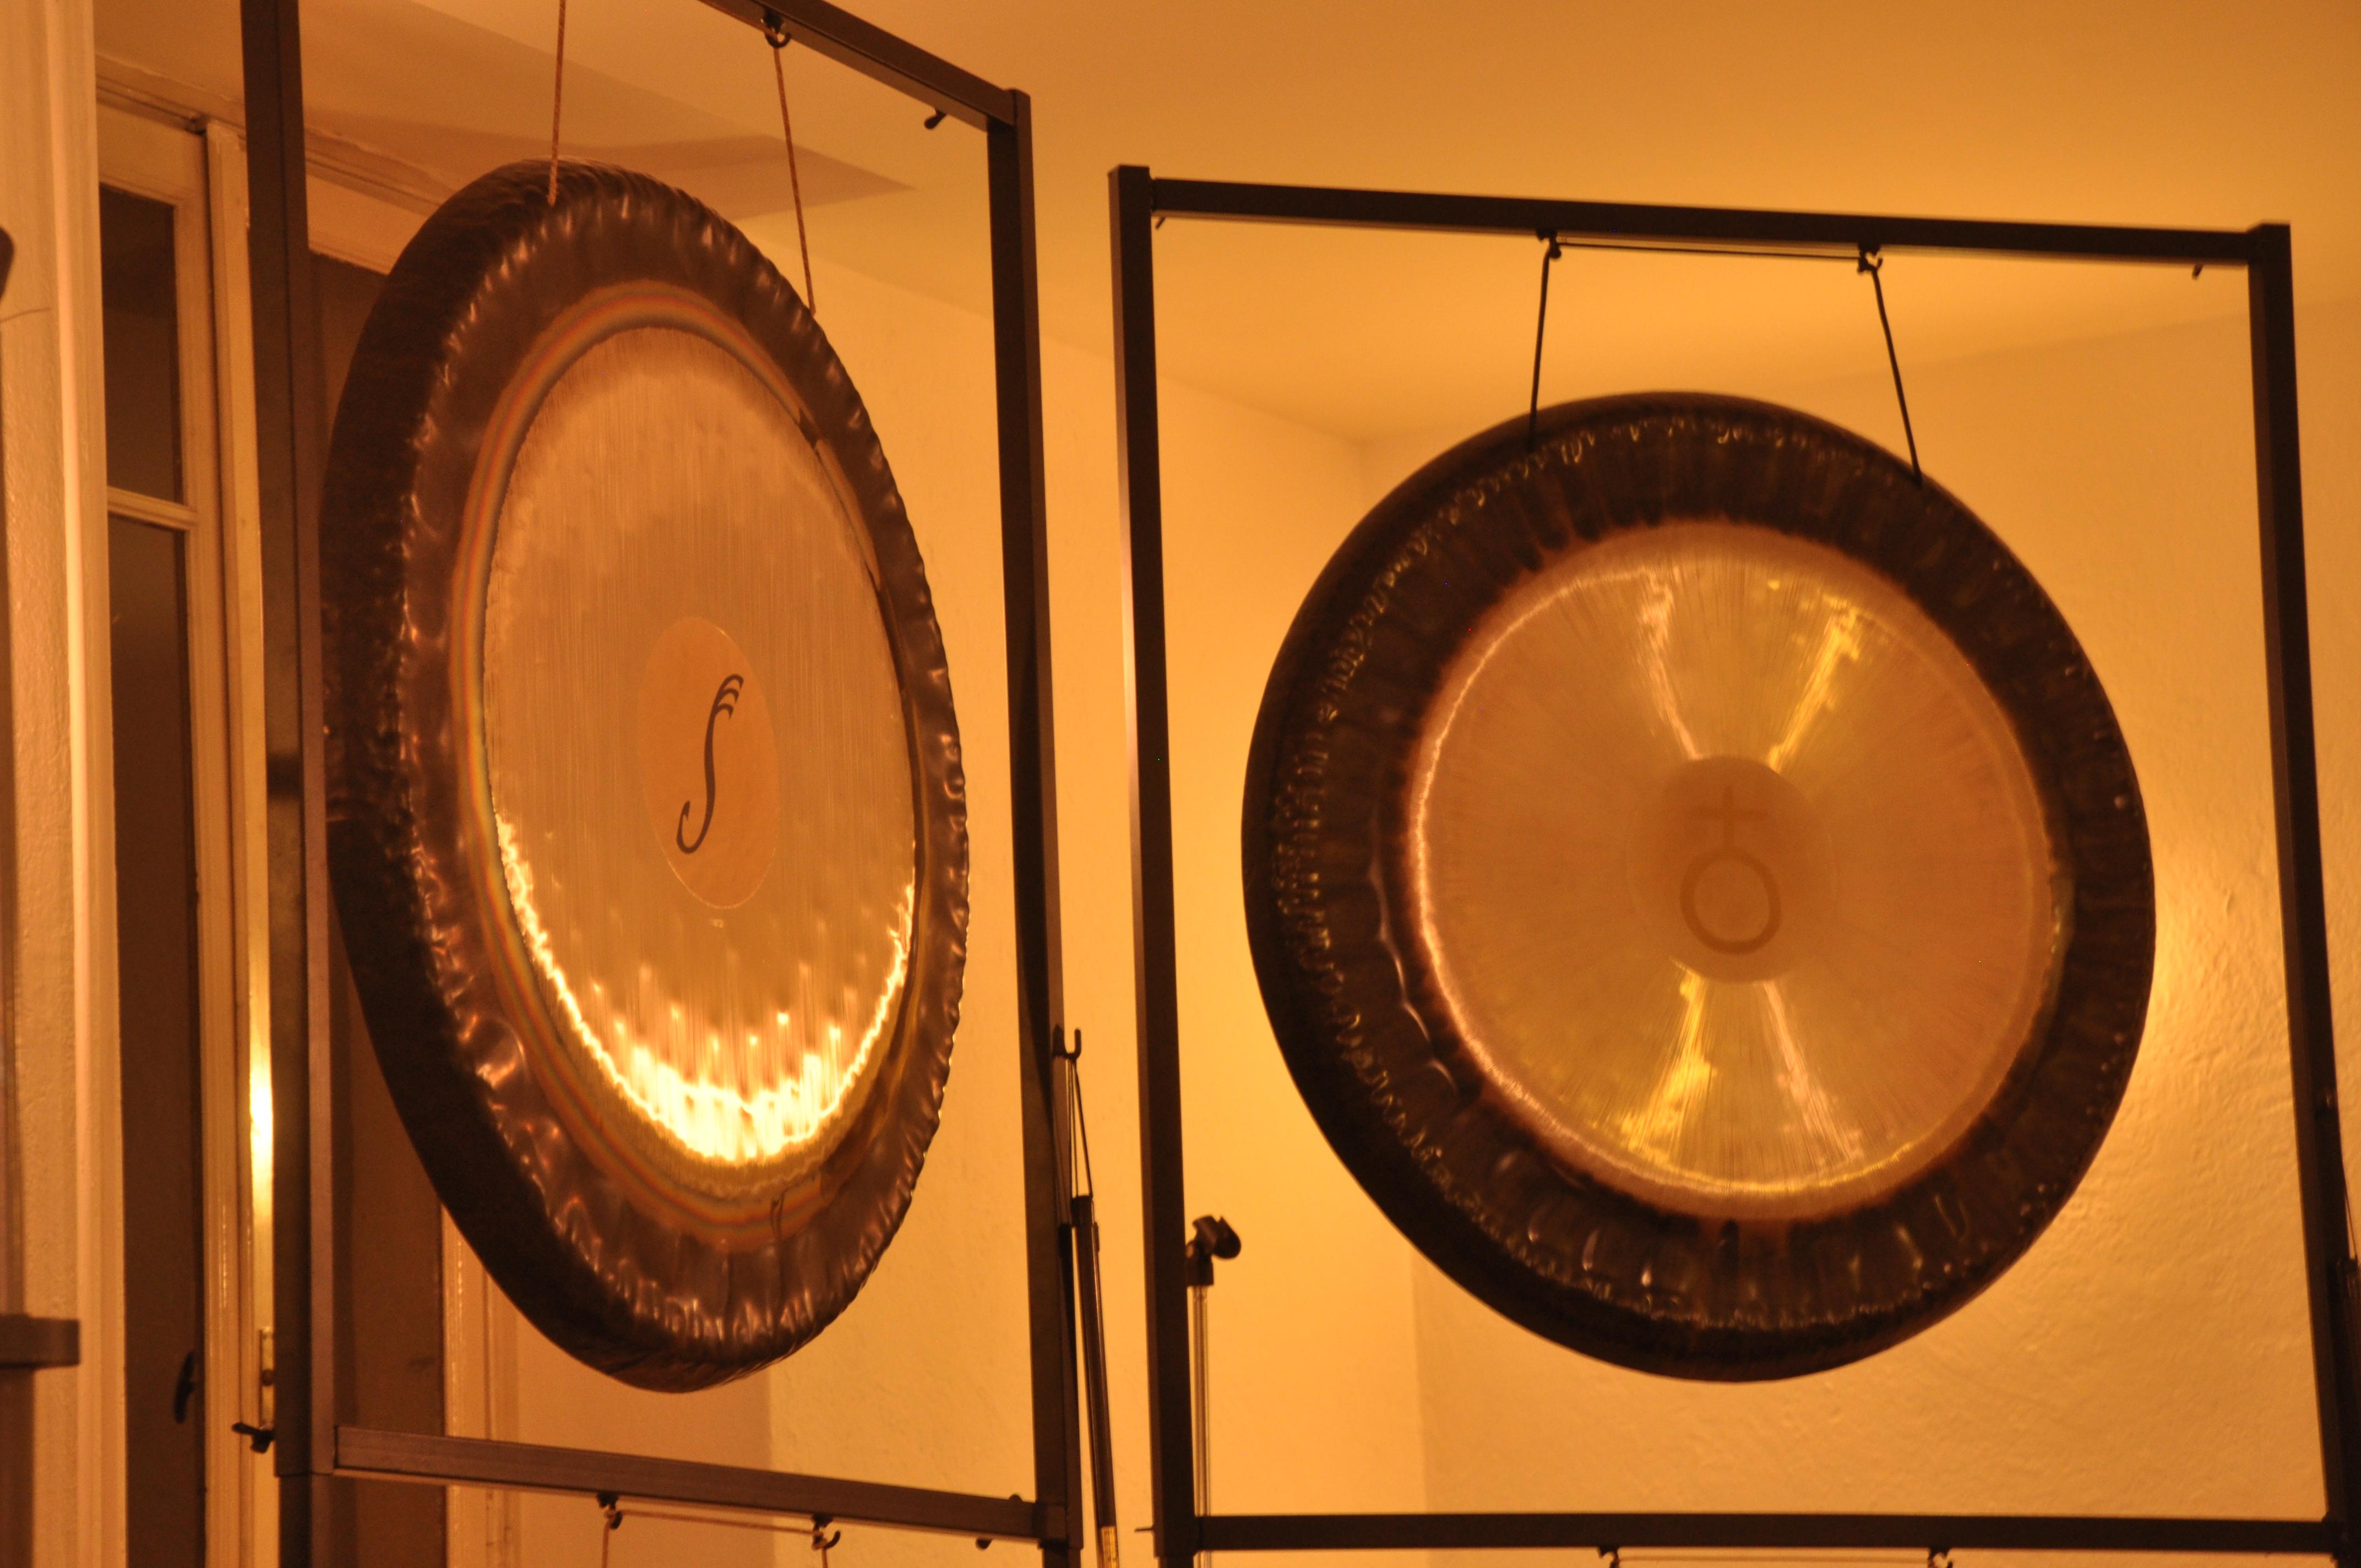 Bagni di gong a biella gong heart - Bagno di gong effetti negativi ...